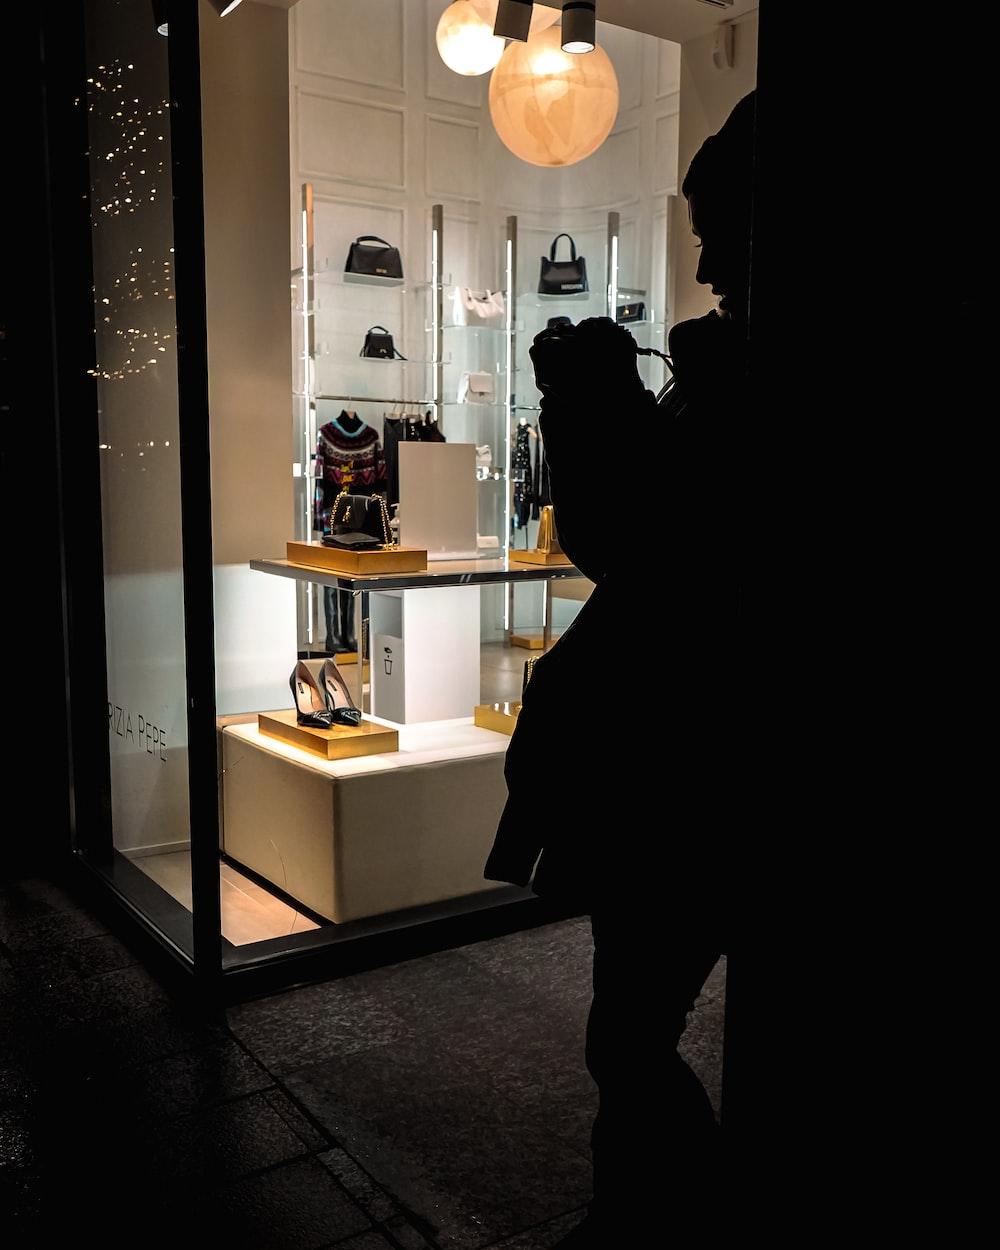 person in black coat standing in front of mirror